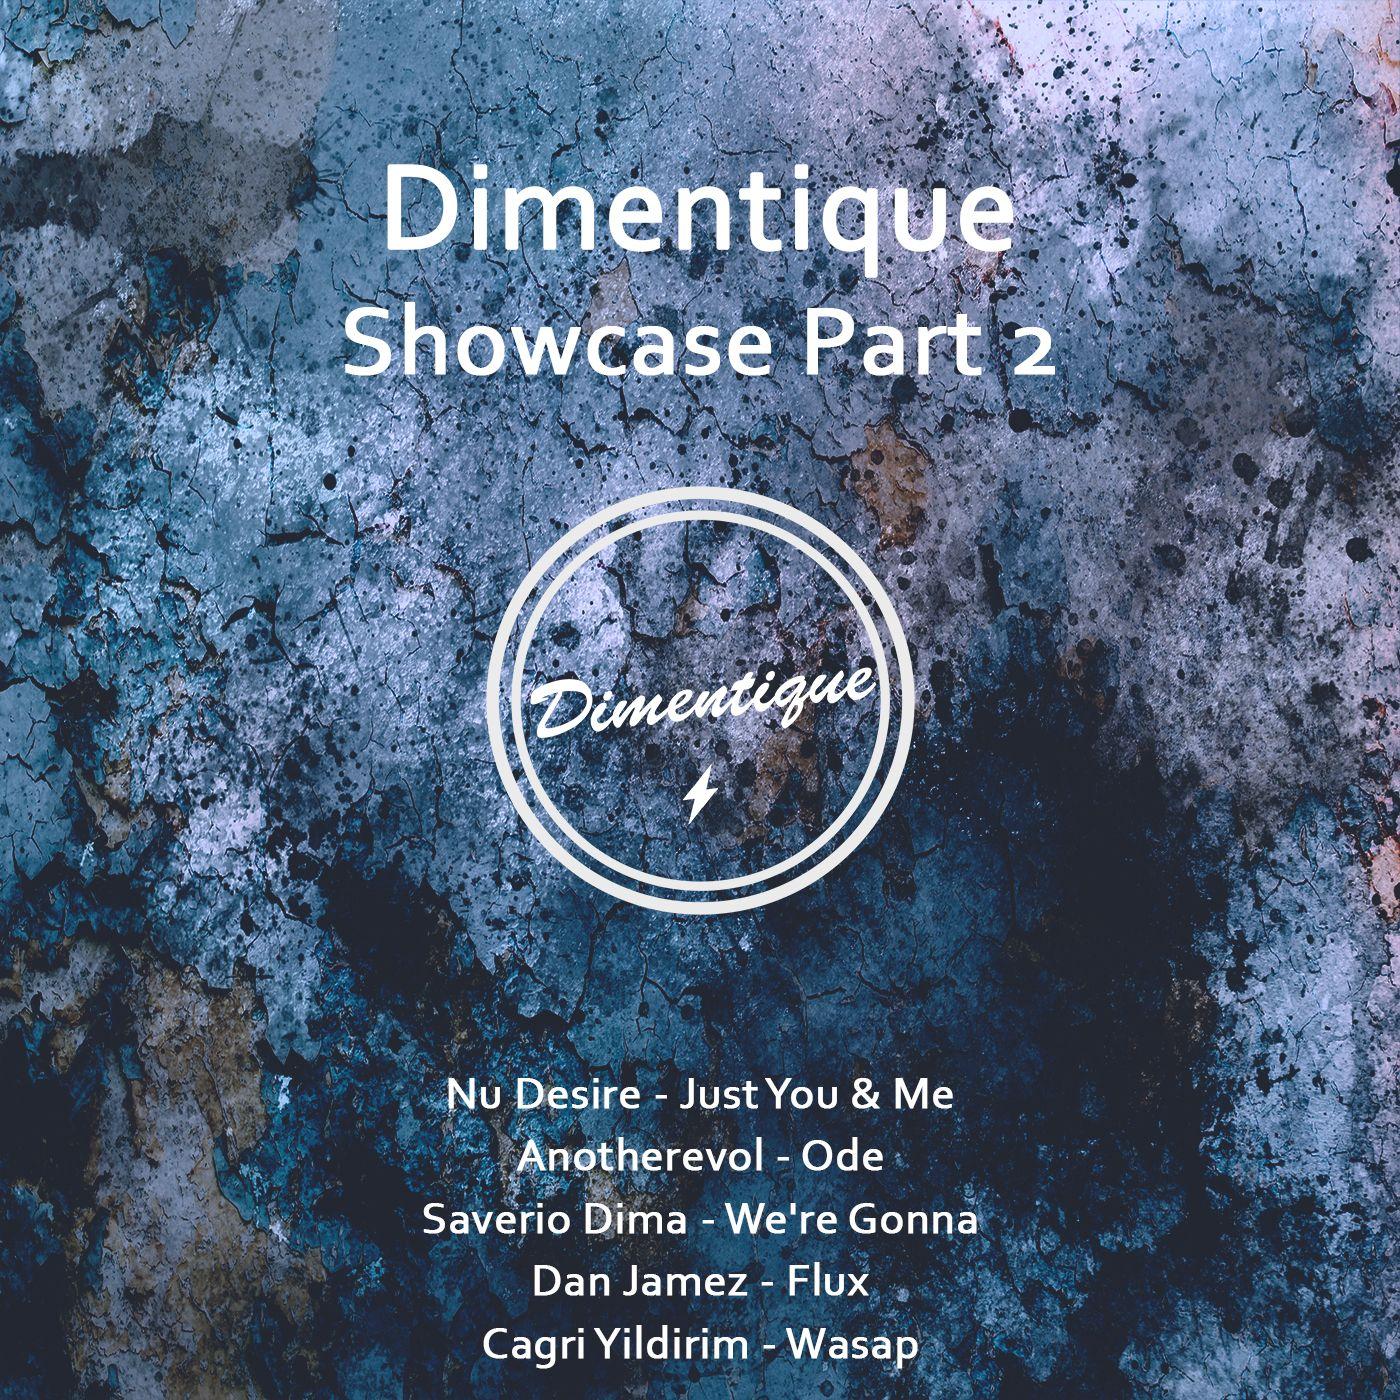 dimentique_new_art_2015_showcase_2.jpg